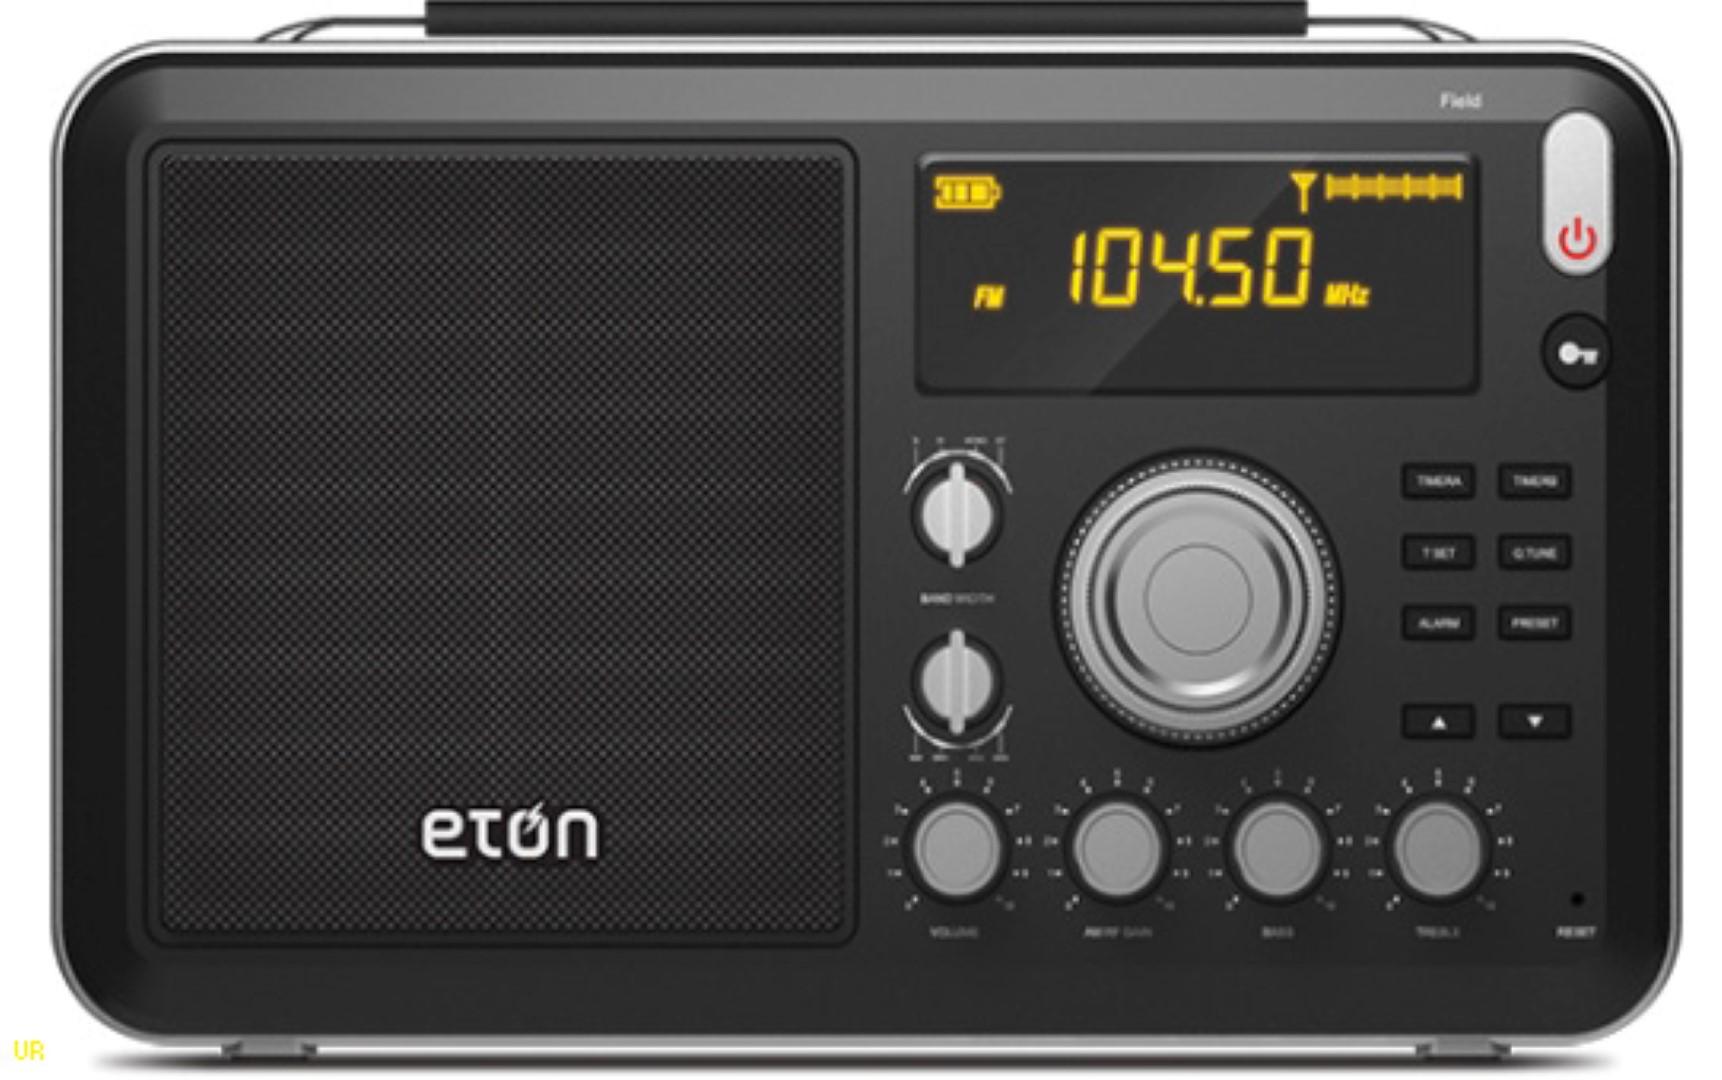 Eton/Grundig Field 550 | radiojayallen